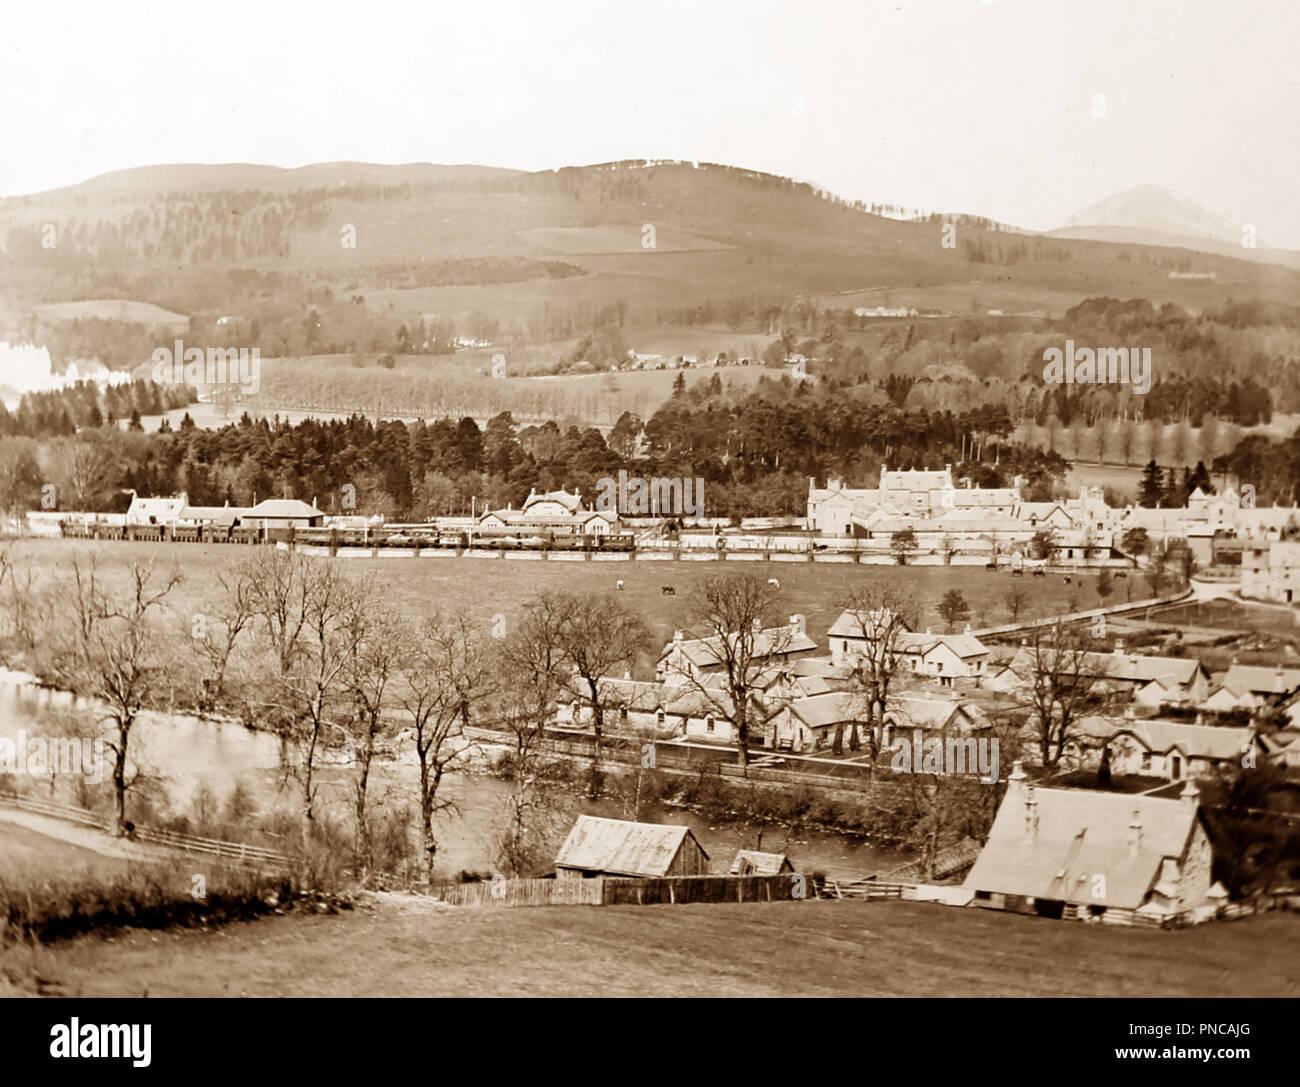 Blair Atholl, Scotland, Victorian period - Stock Image